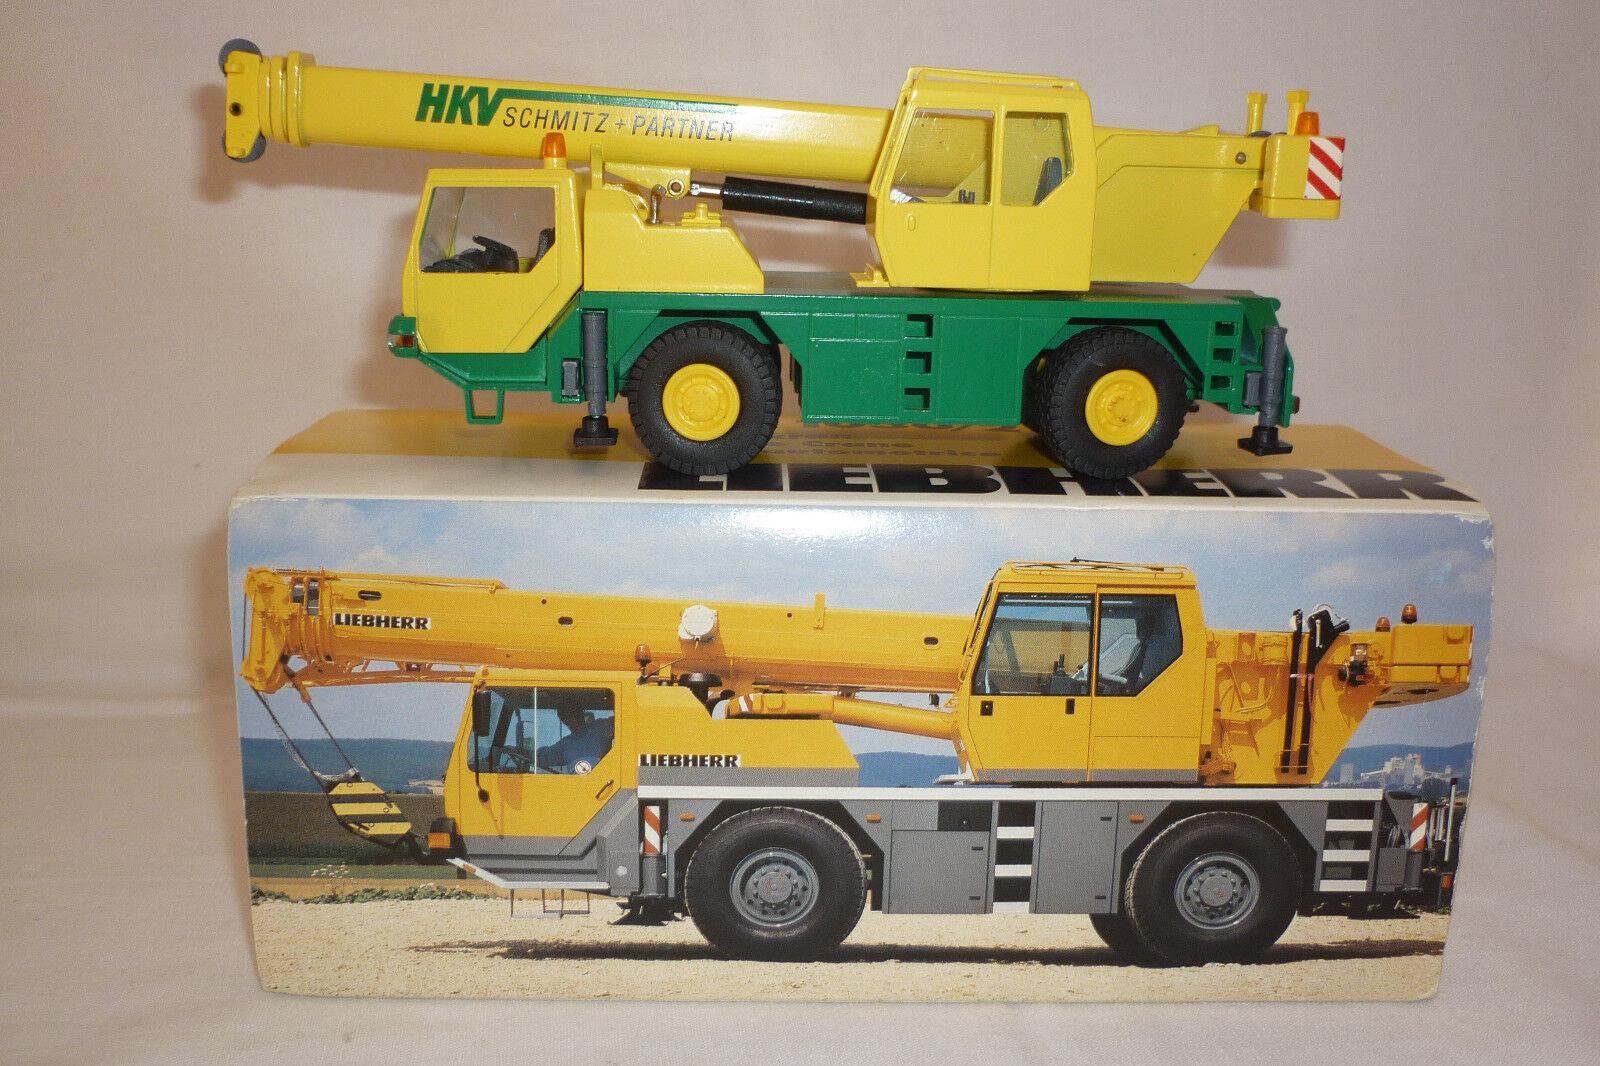 Conrad - Metal Model Liebherr Hkv Schmitz + Partner Mobile Crane 1 50 Ovp 7.bm-2